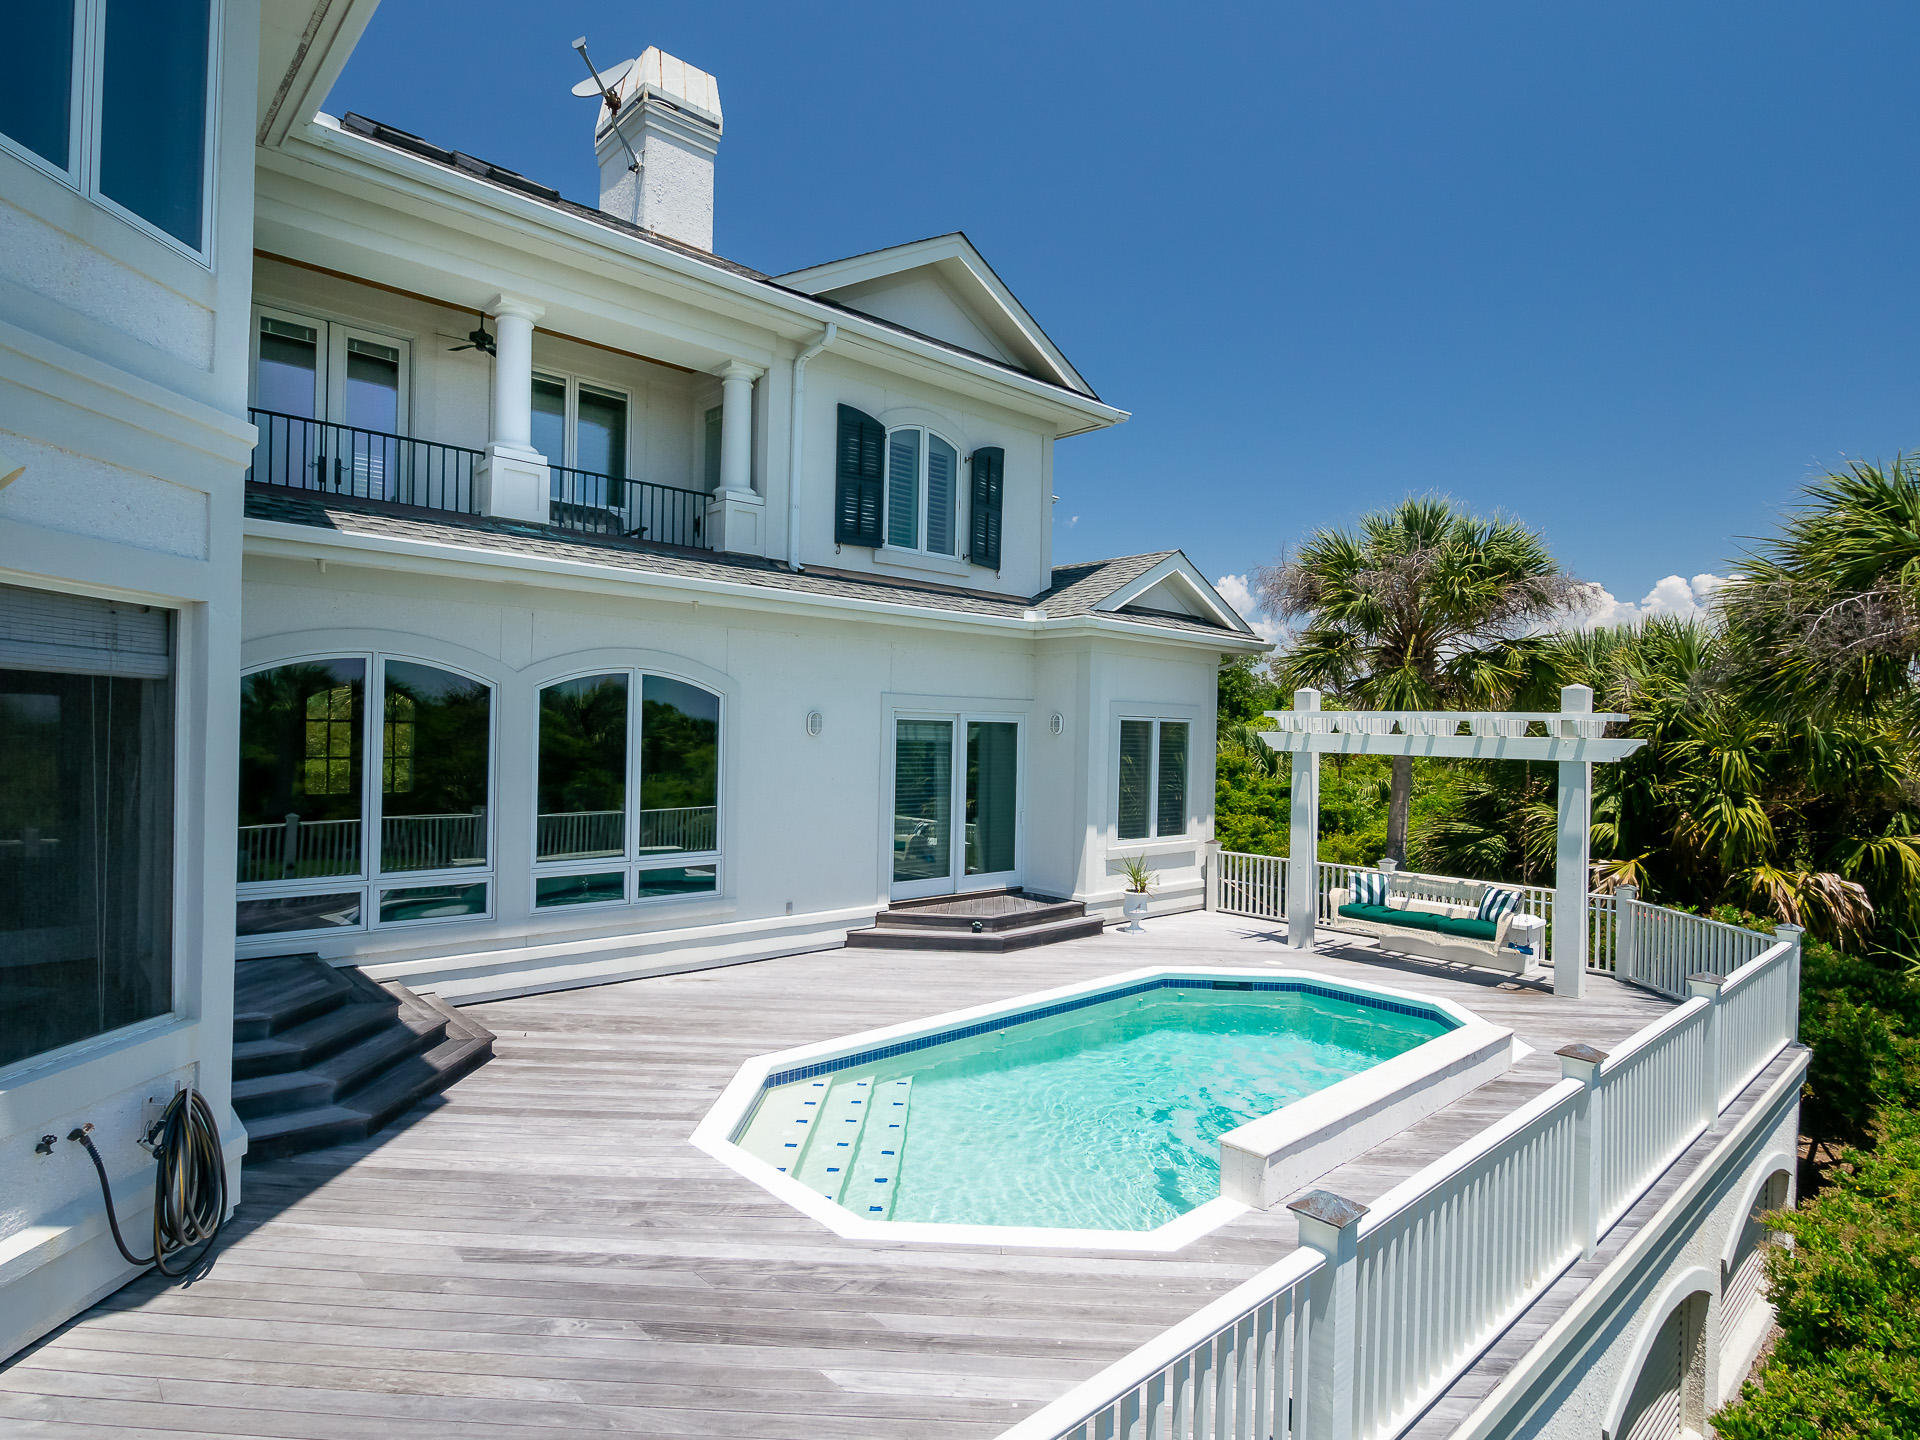 Seabrook Island Homes For Sale - 2216 Rolling Dune, Seabrook Island, SC - 48